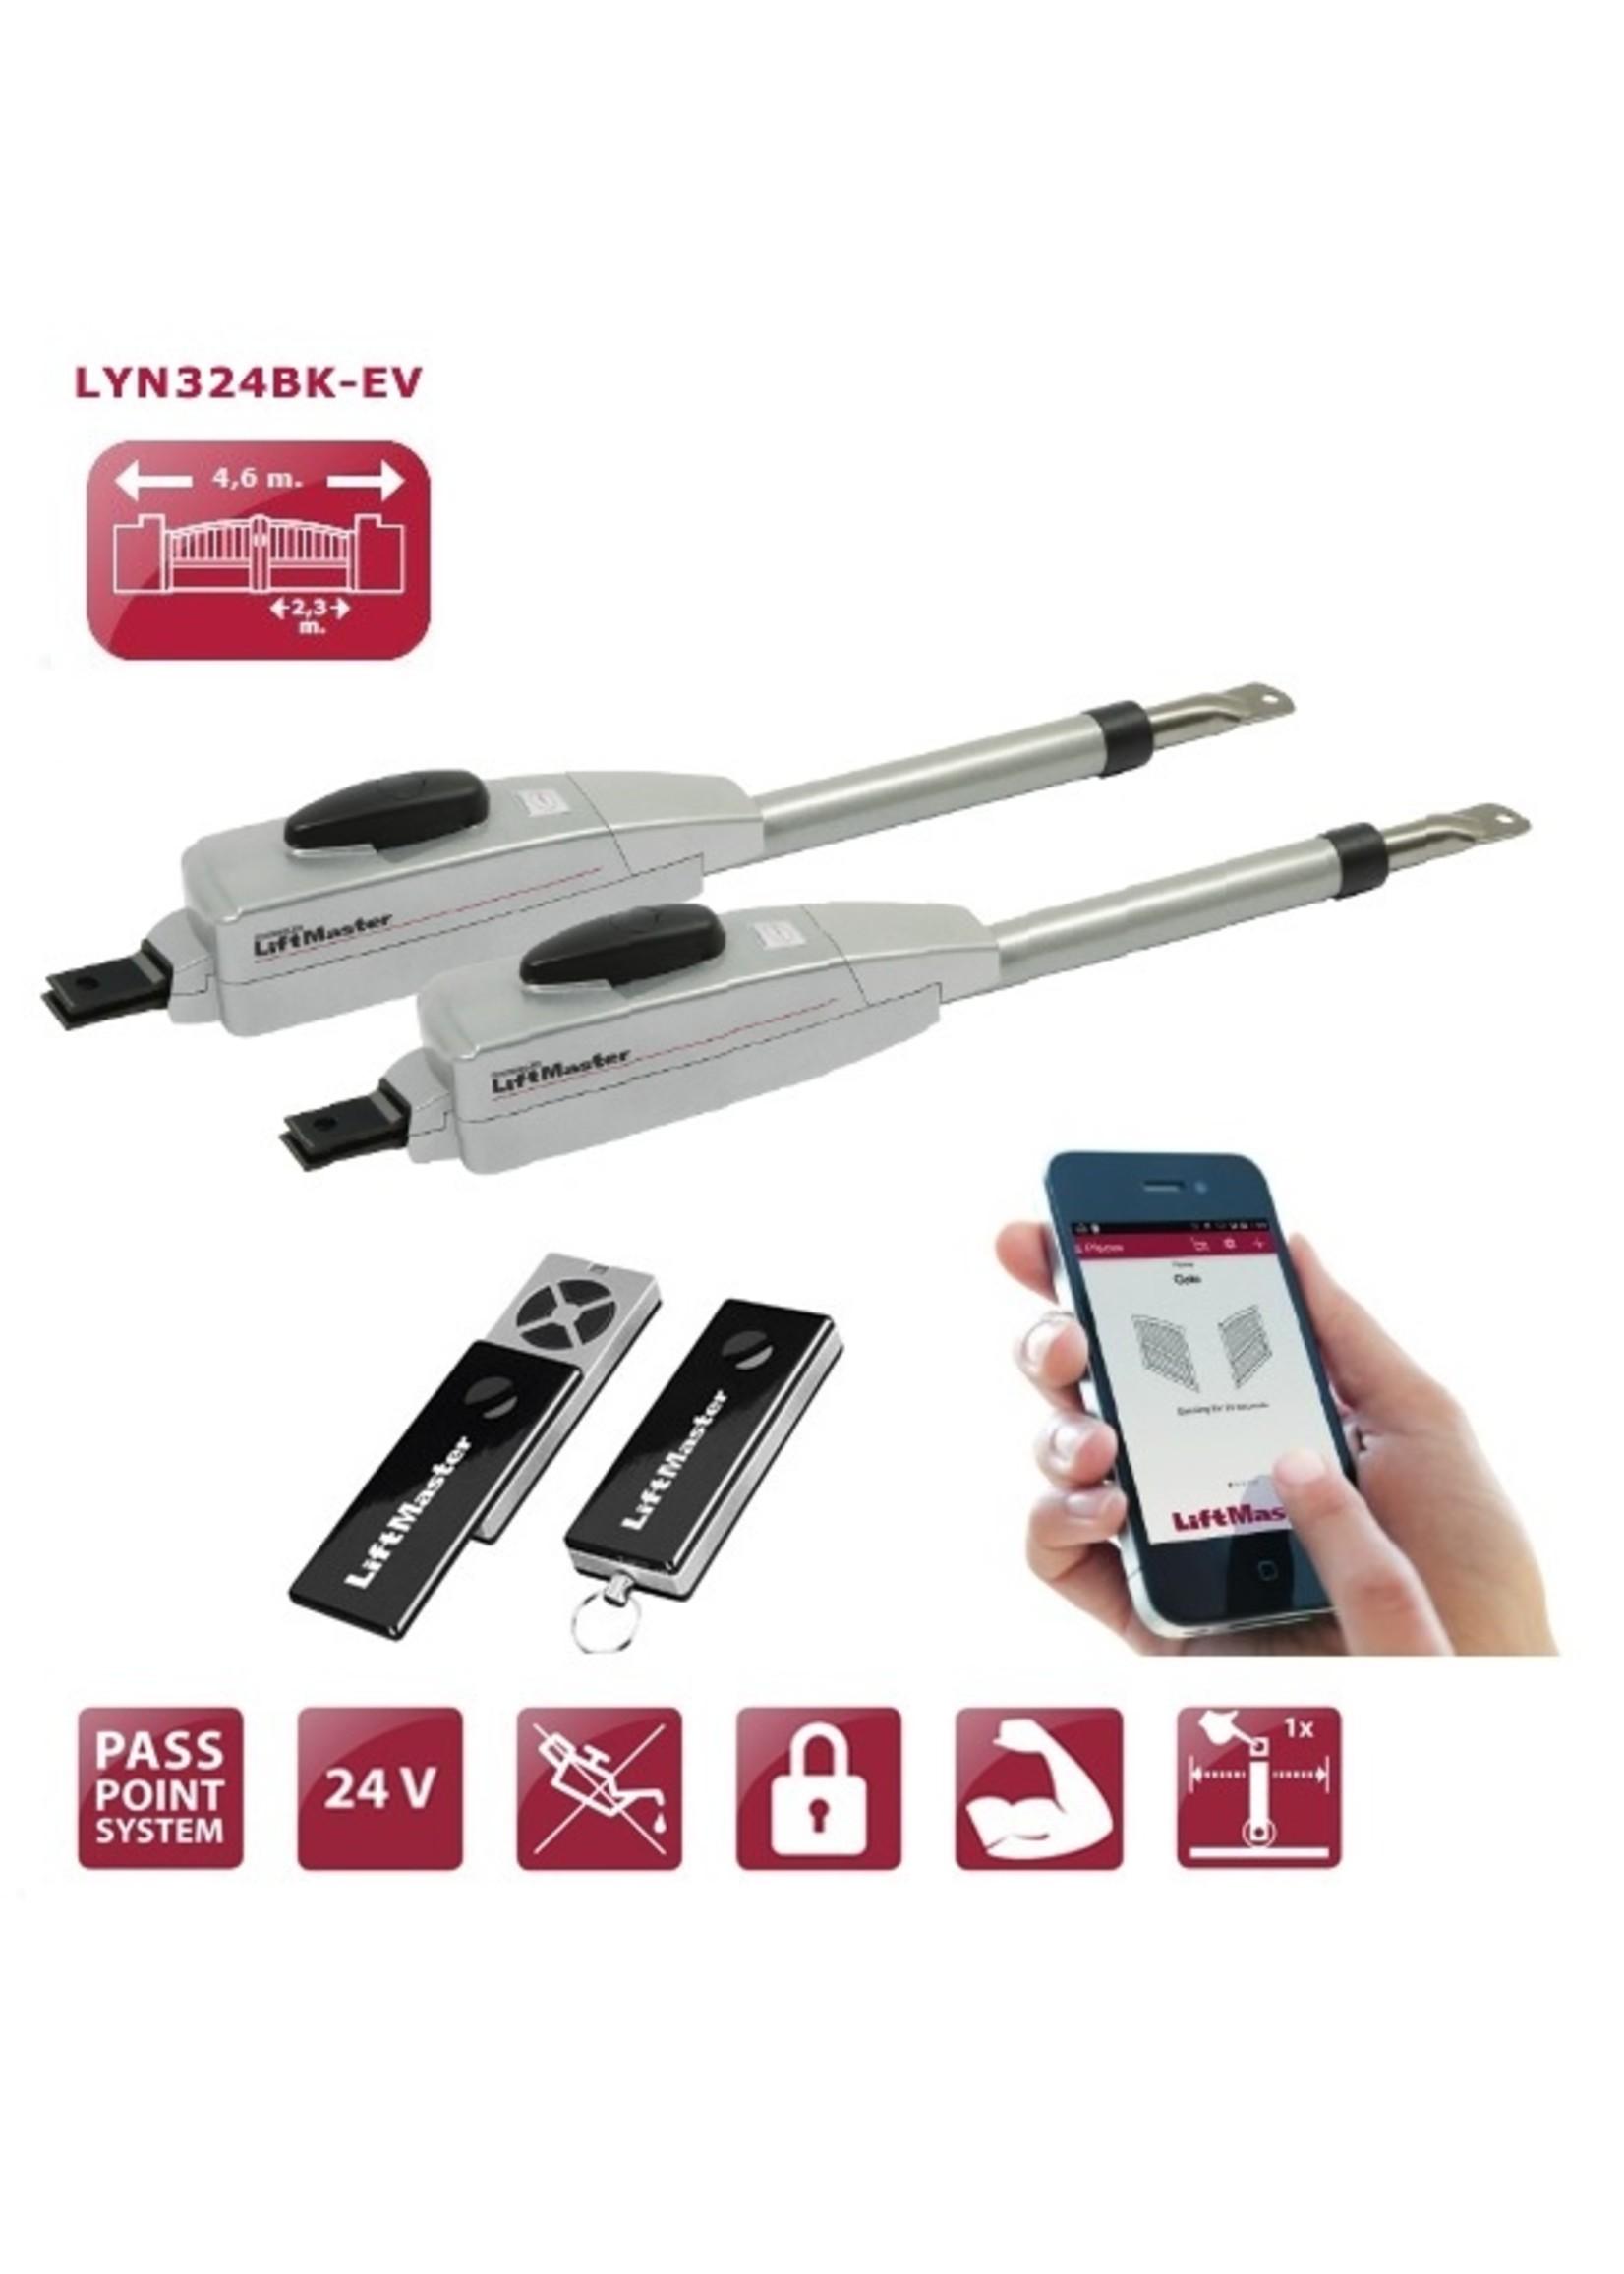 Liftmaster LYN324K-EV 24V automatisme portail à battants LYN300-24